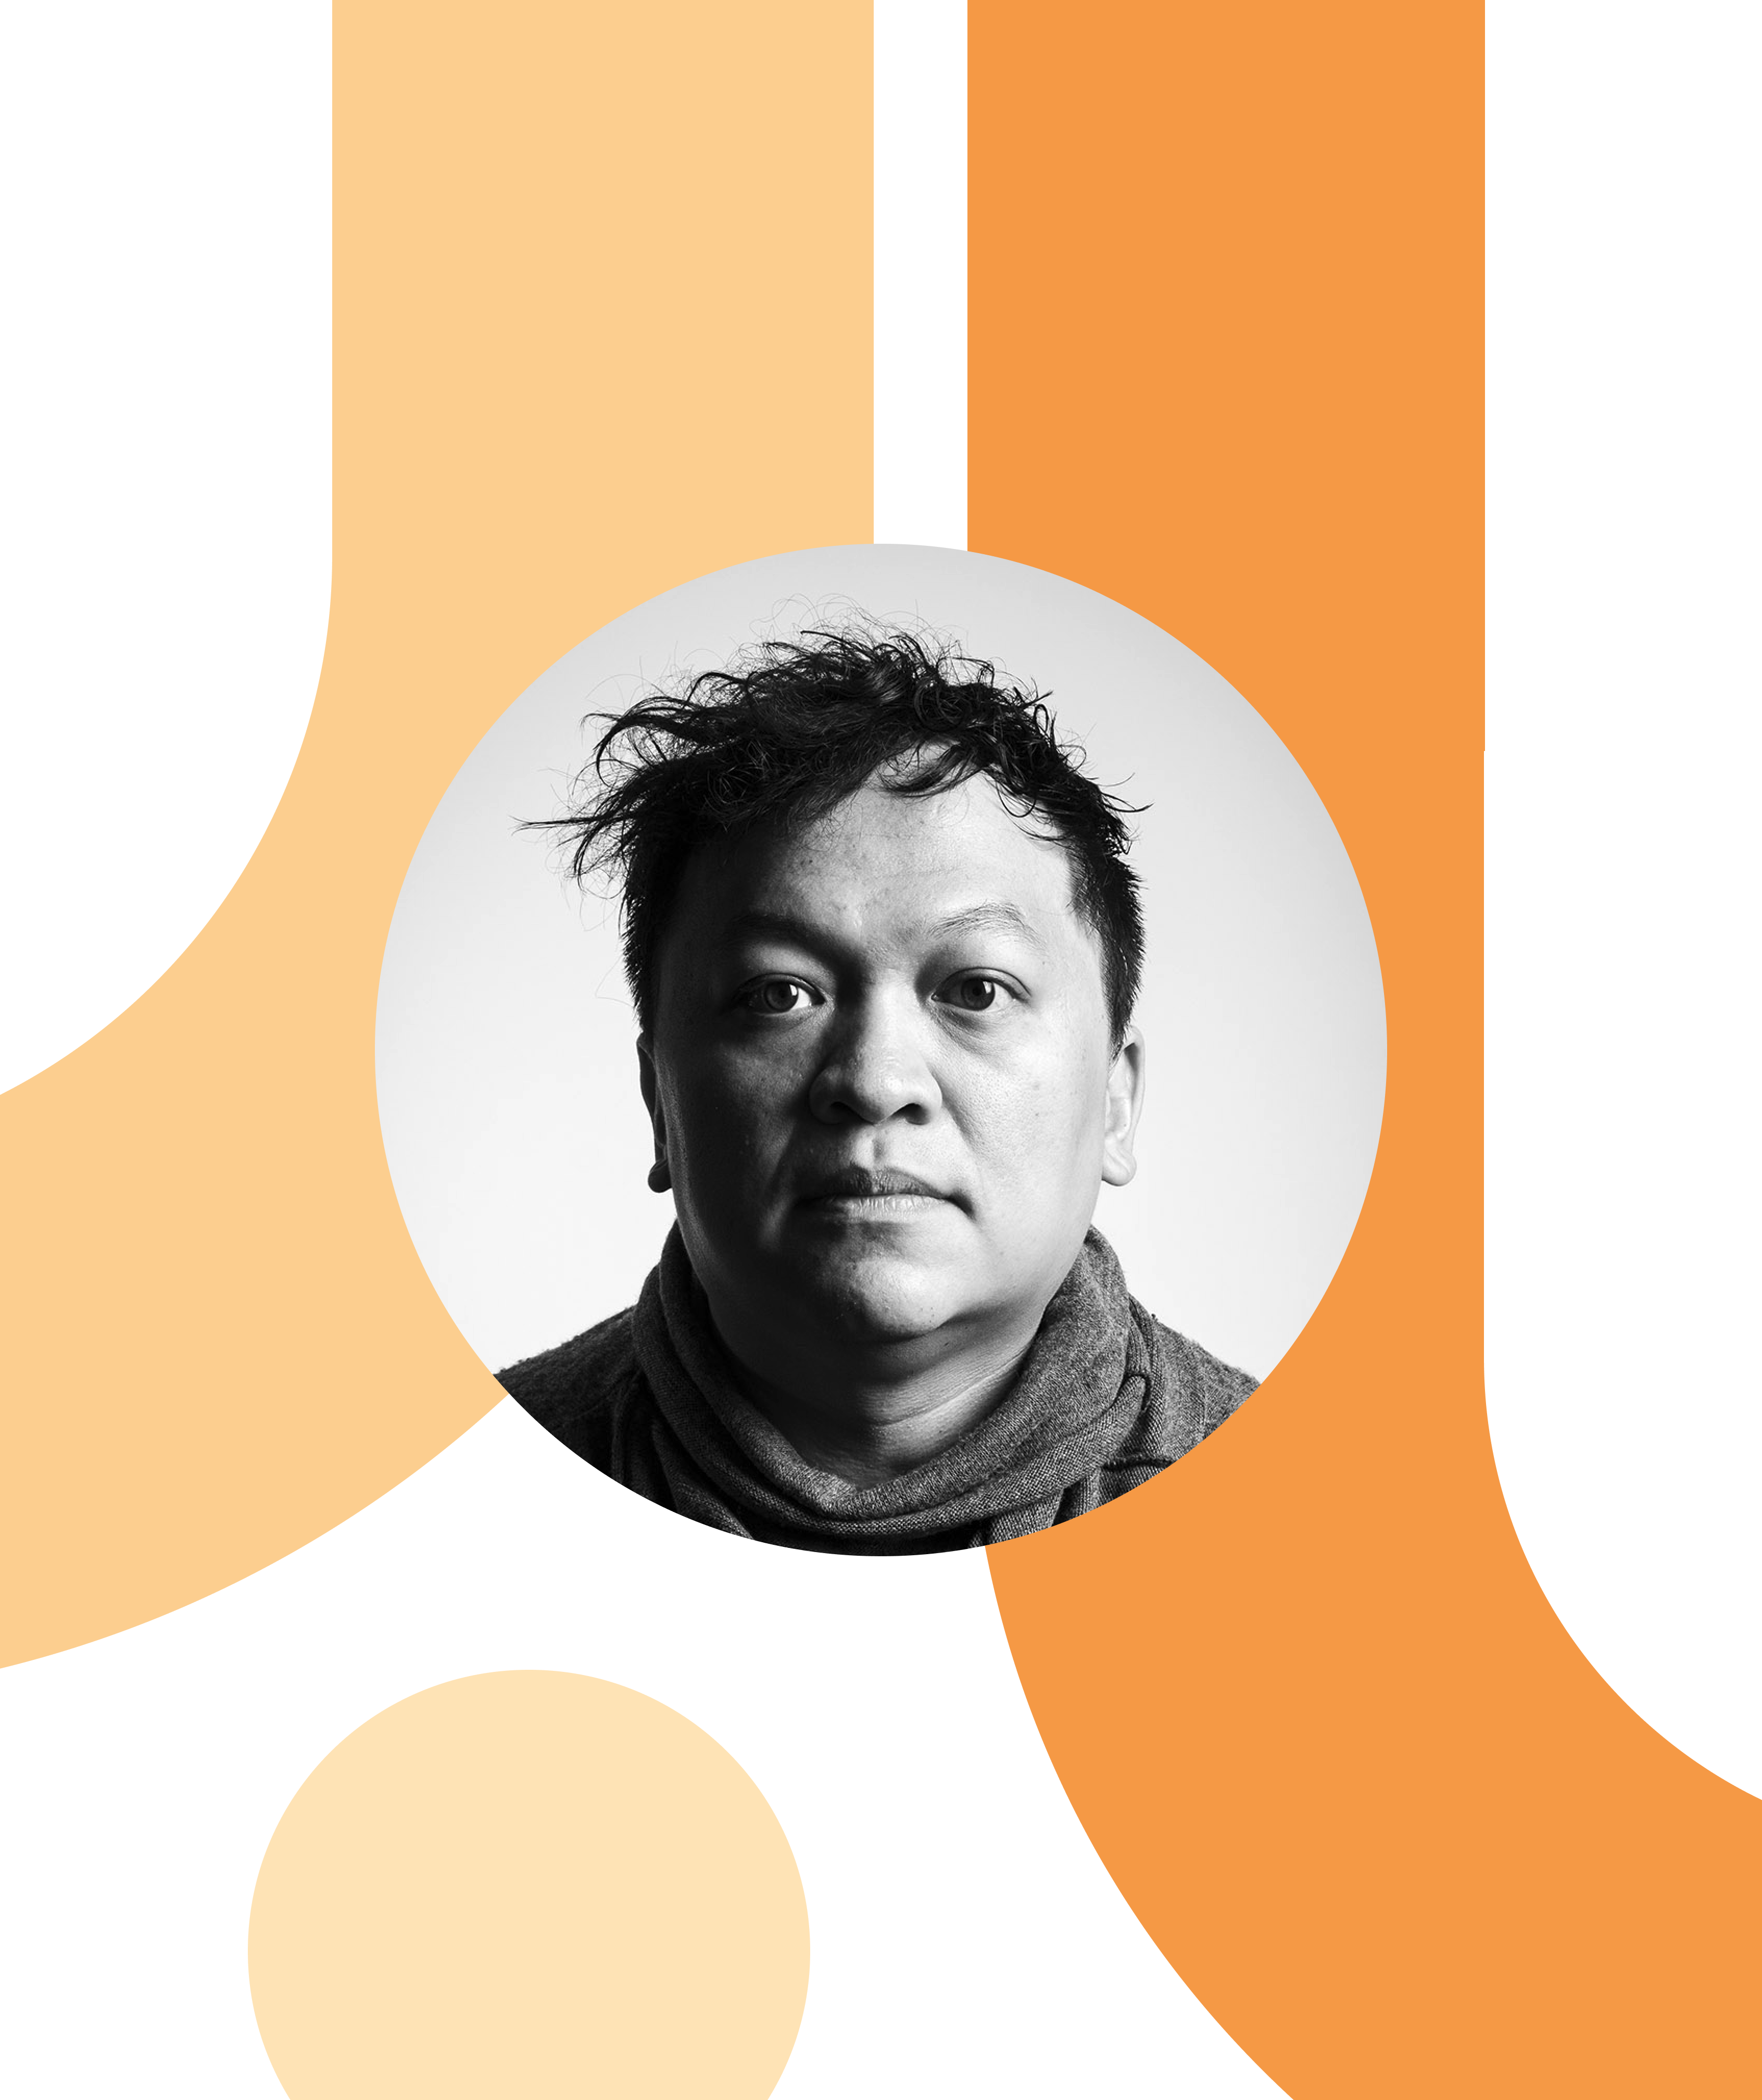 David-Hoang-interview-cover